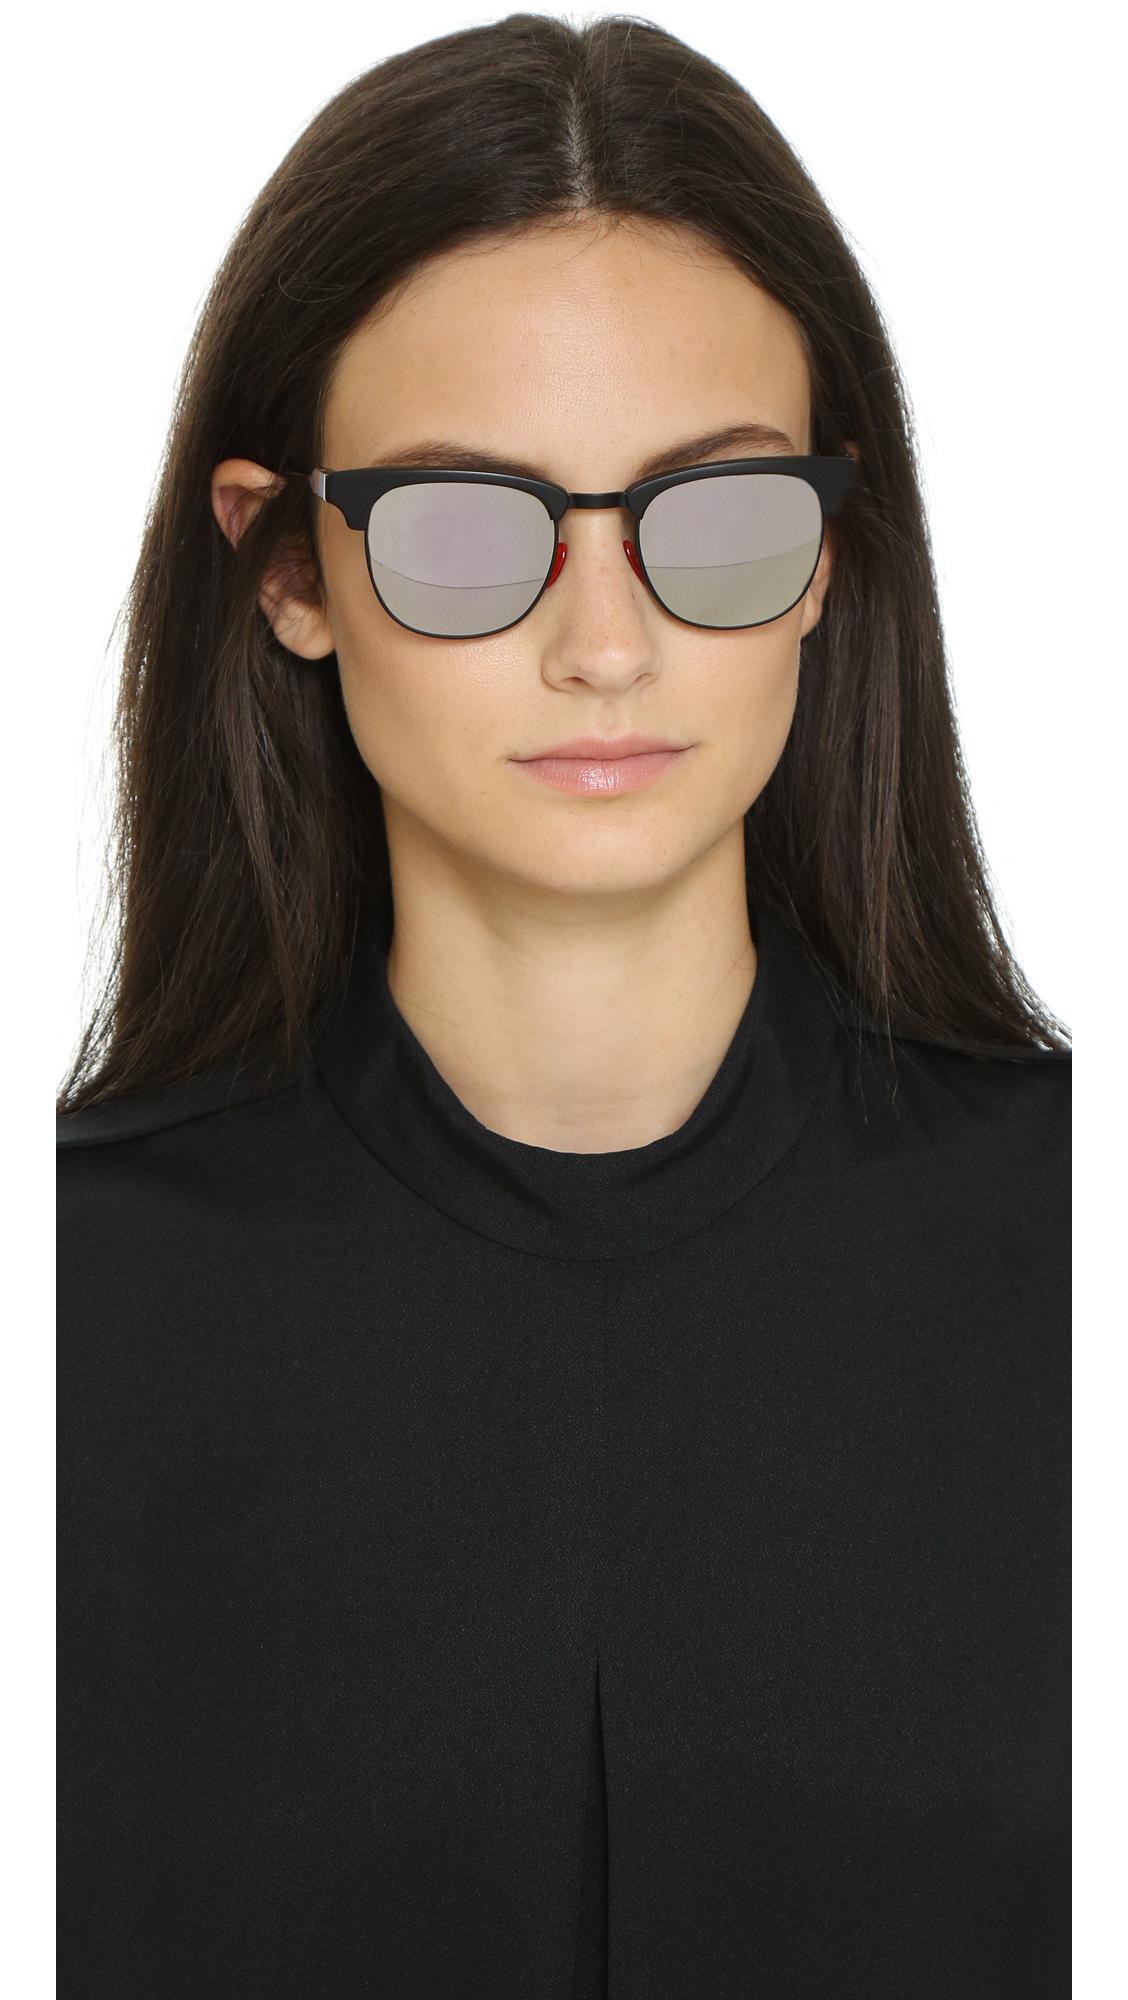 daa9394a95a Lyst - Westward Leaning Vanguard 3 Sunglasses - Matte Black Super ...